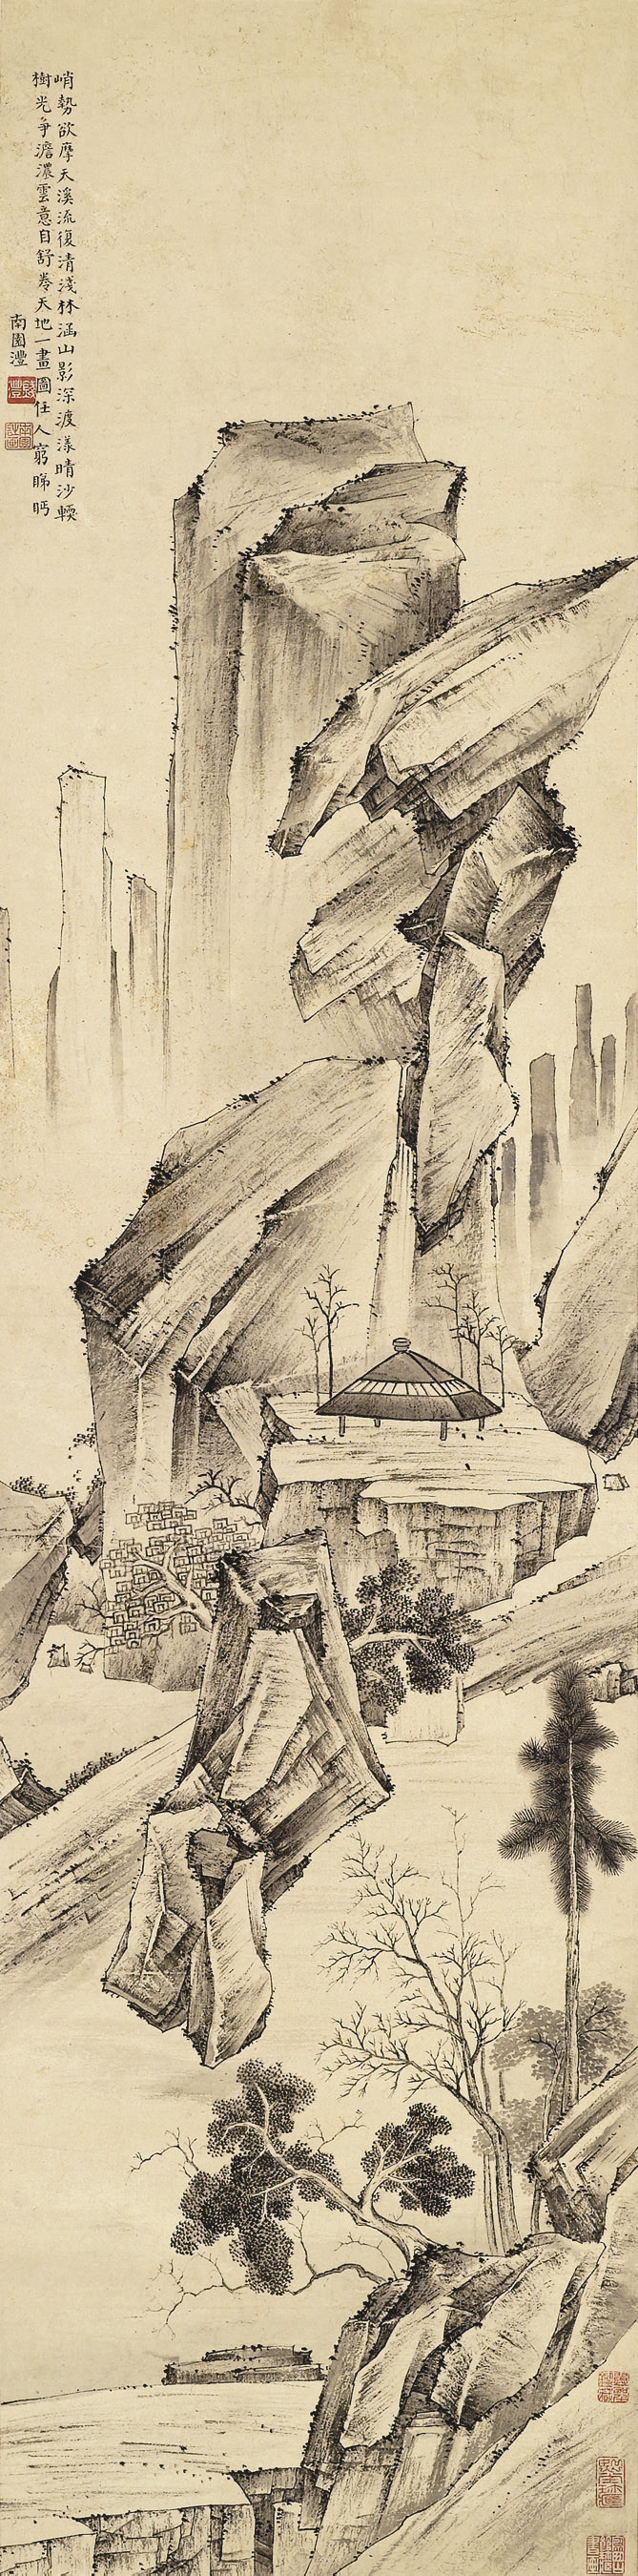 QIAN LI(1740-1795)